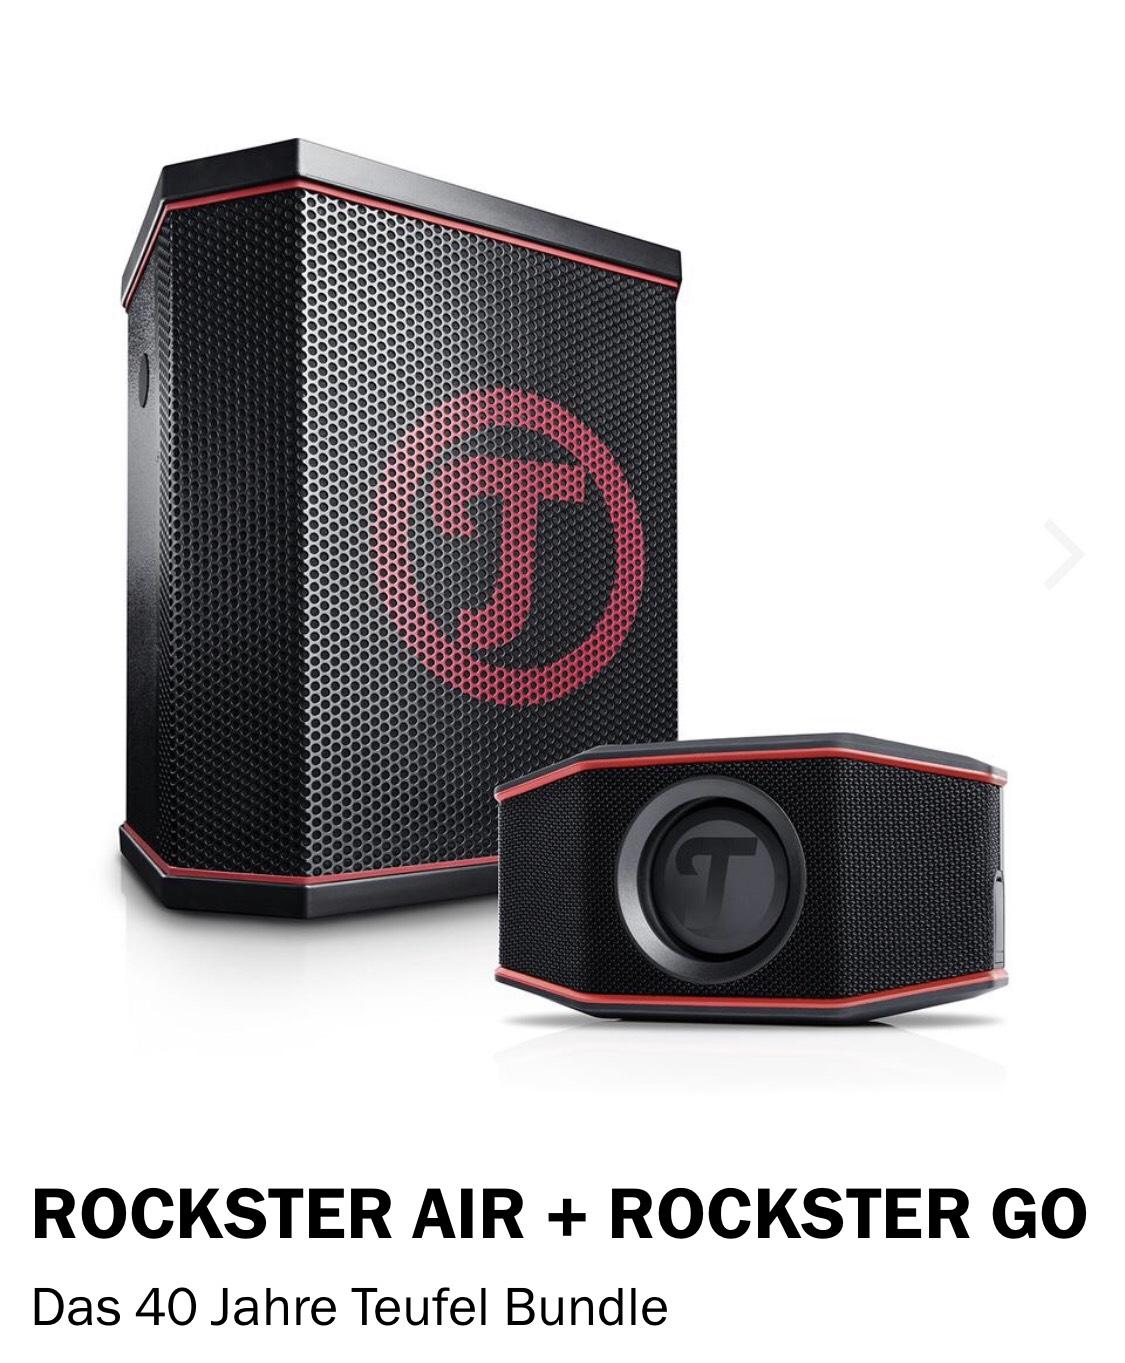 Teufel Bluetooth Lautsprecher ROCKSTER AIR + ROCKSTER GO Das 40 Jahre Teufel Bundle